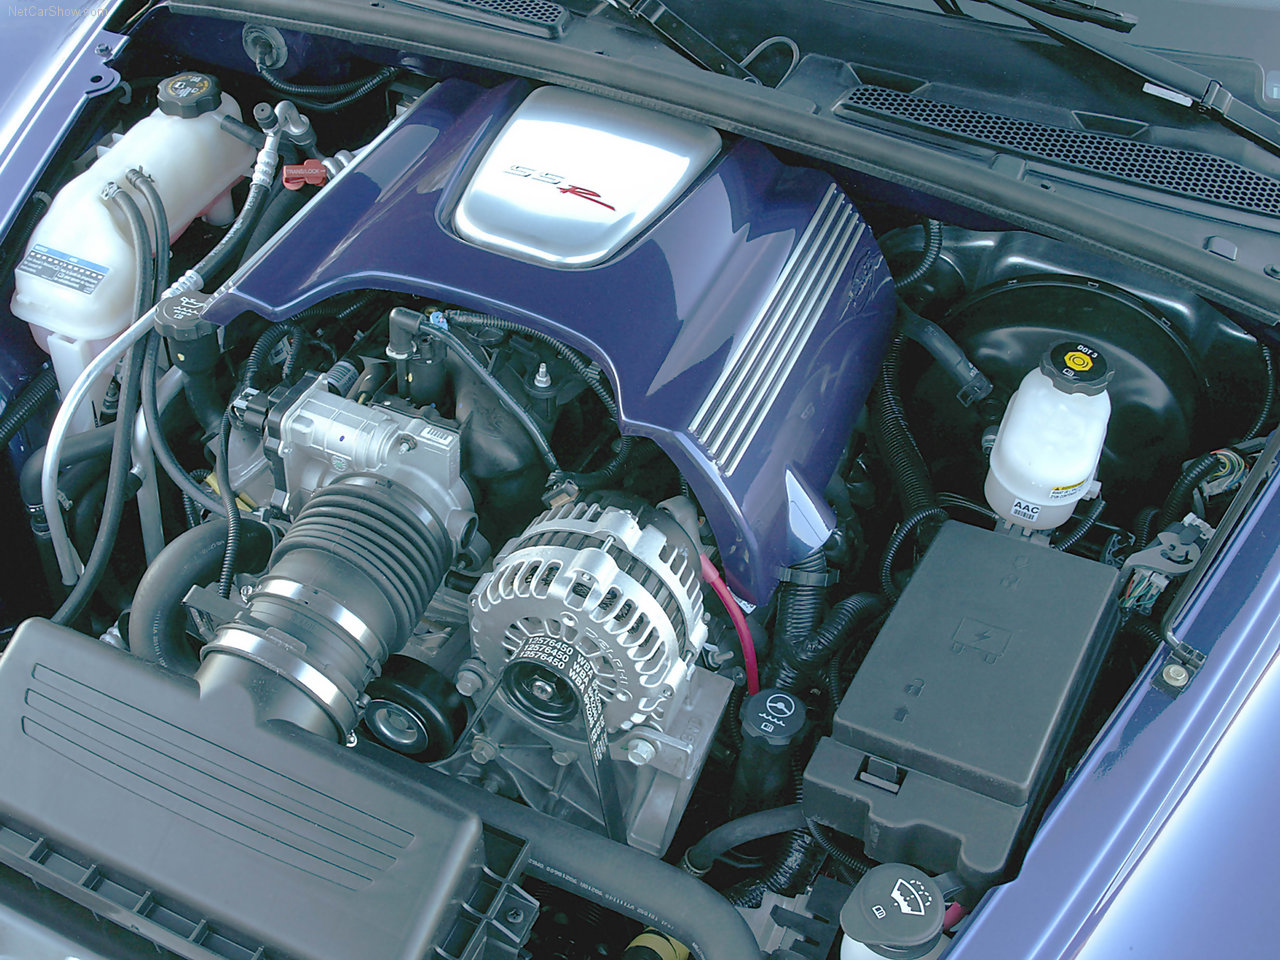 2003 Chevrolet SSR engine